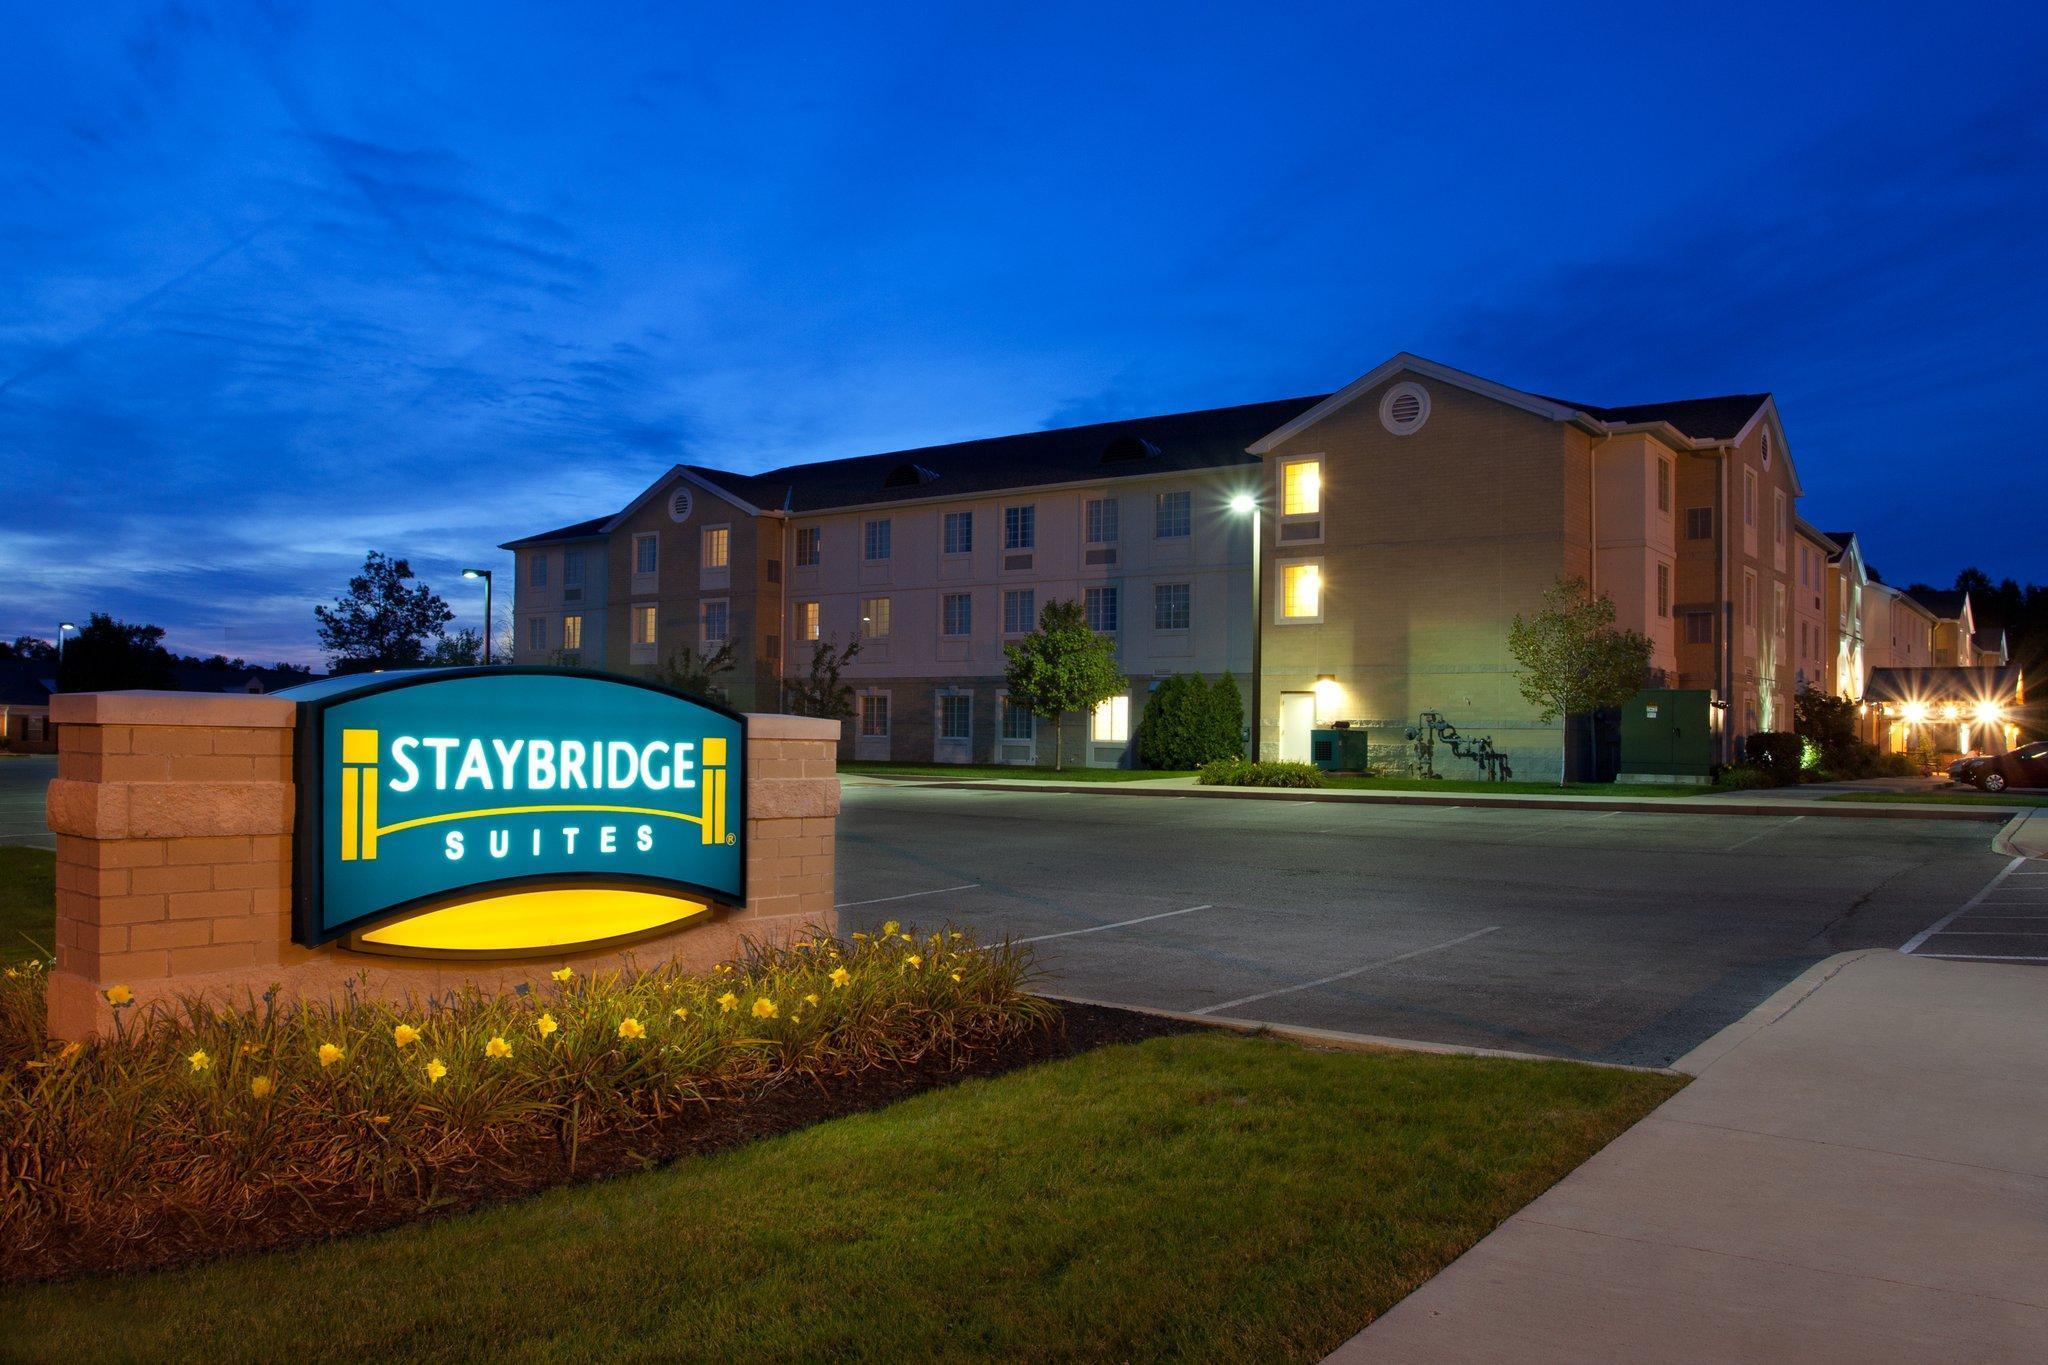 Staybridge Suites Cleveland Mayfield Heights Beachwood